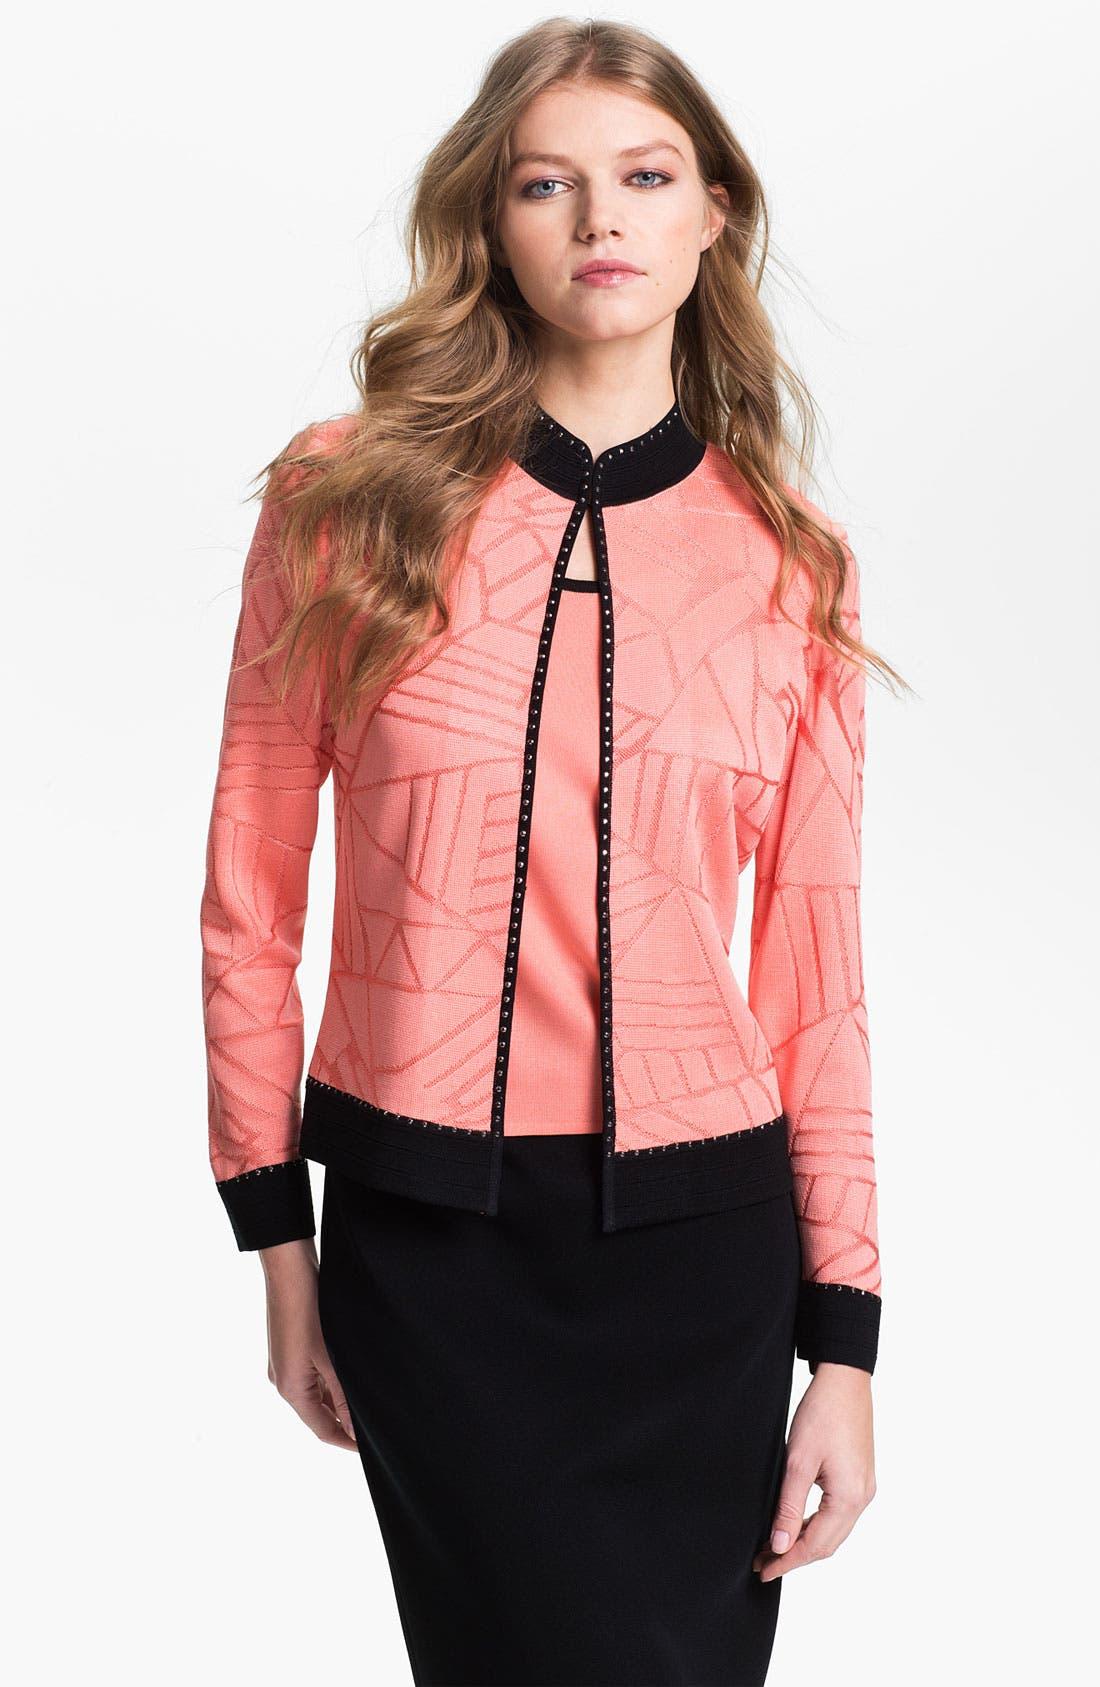 Alternate Image 1 Selected - Ming Wang Embellished Stand Collar Jacket